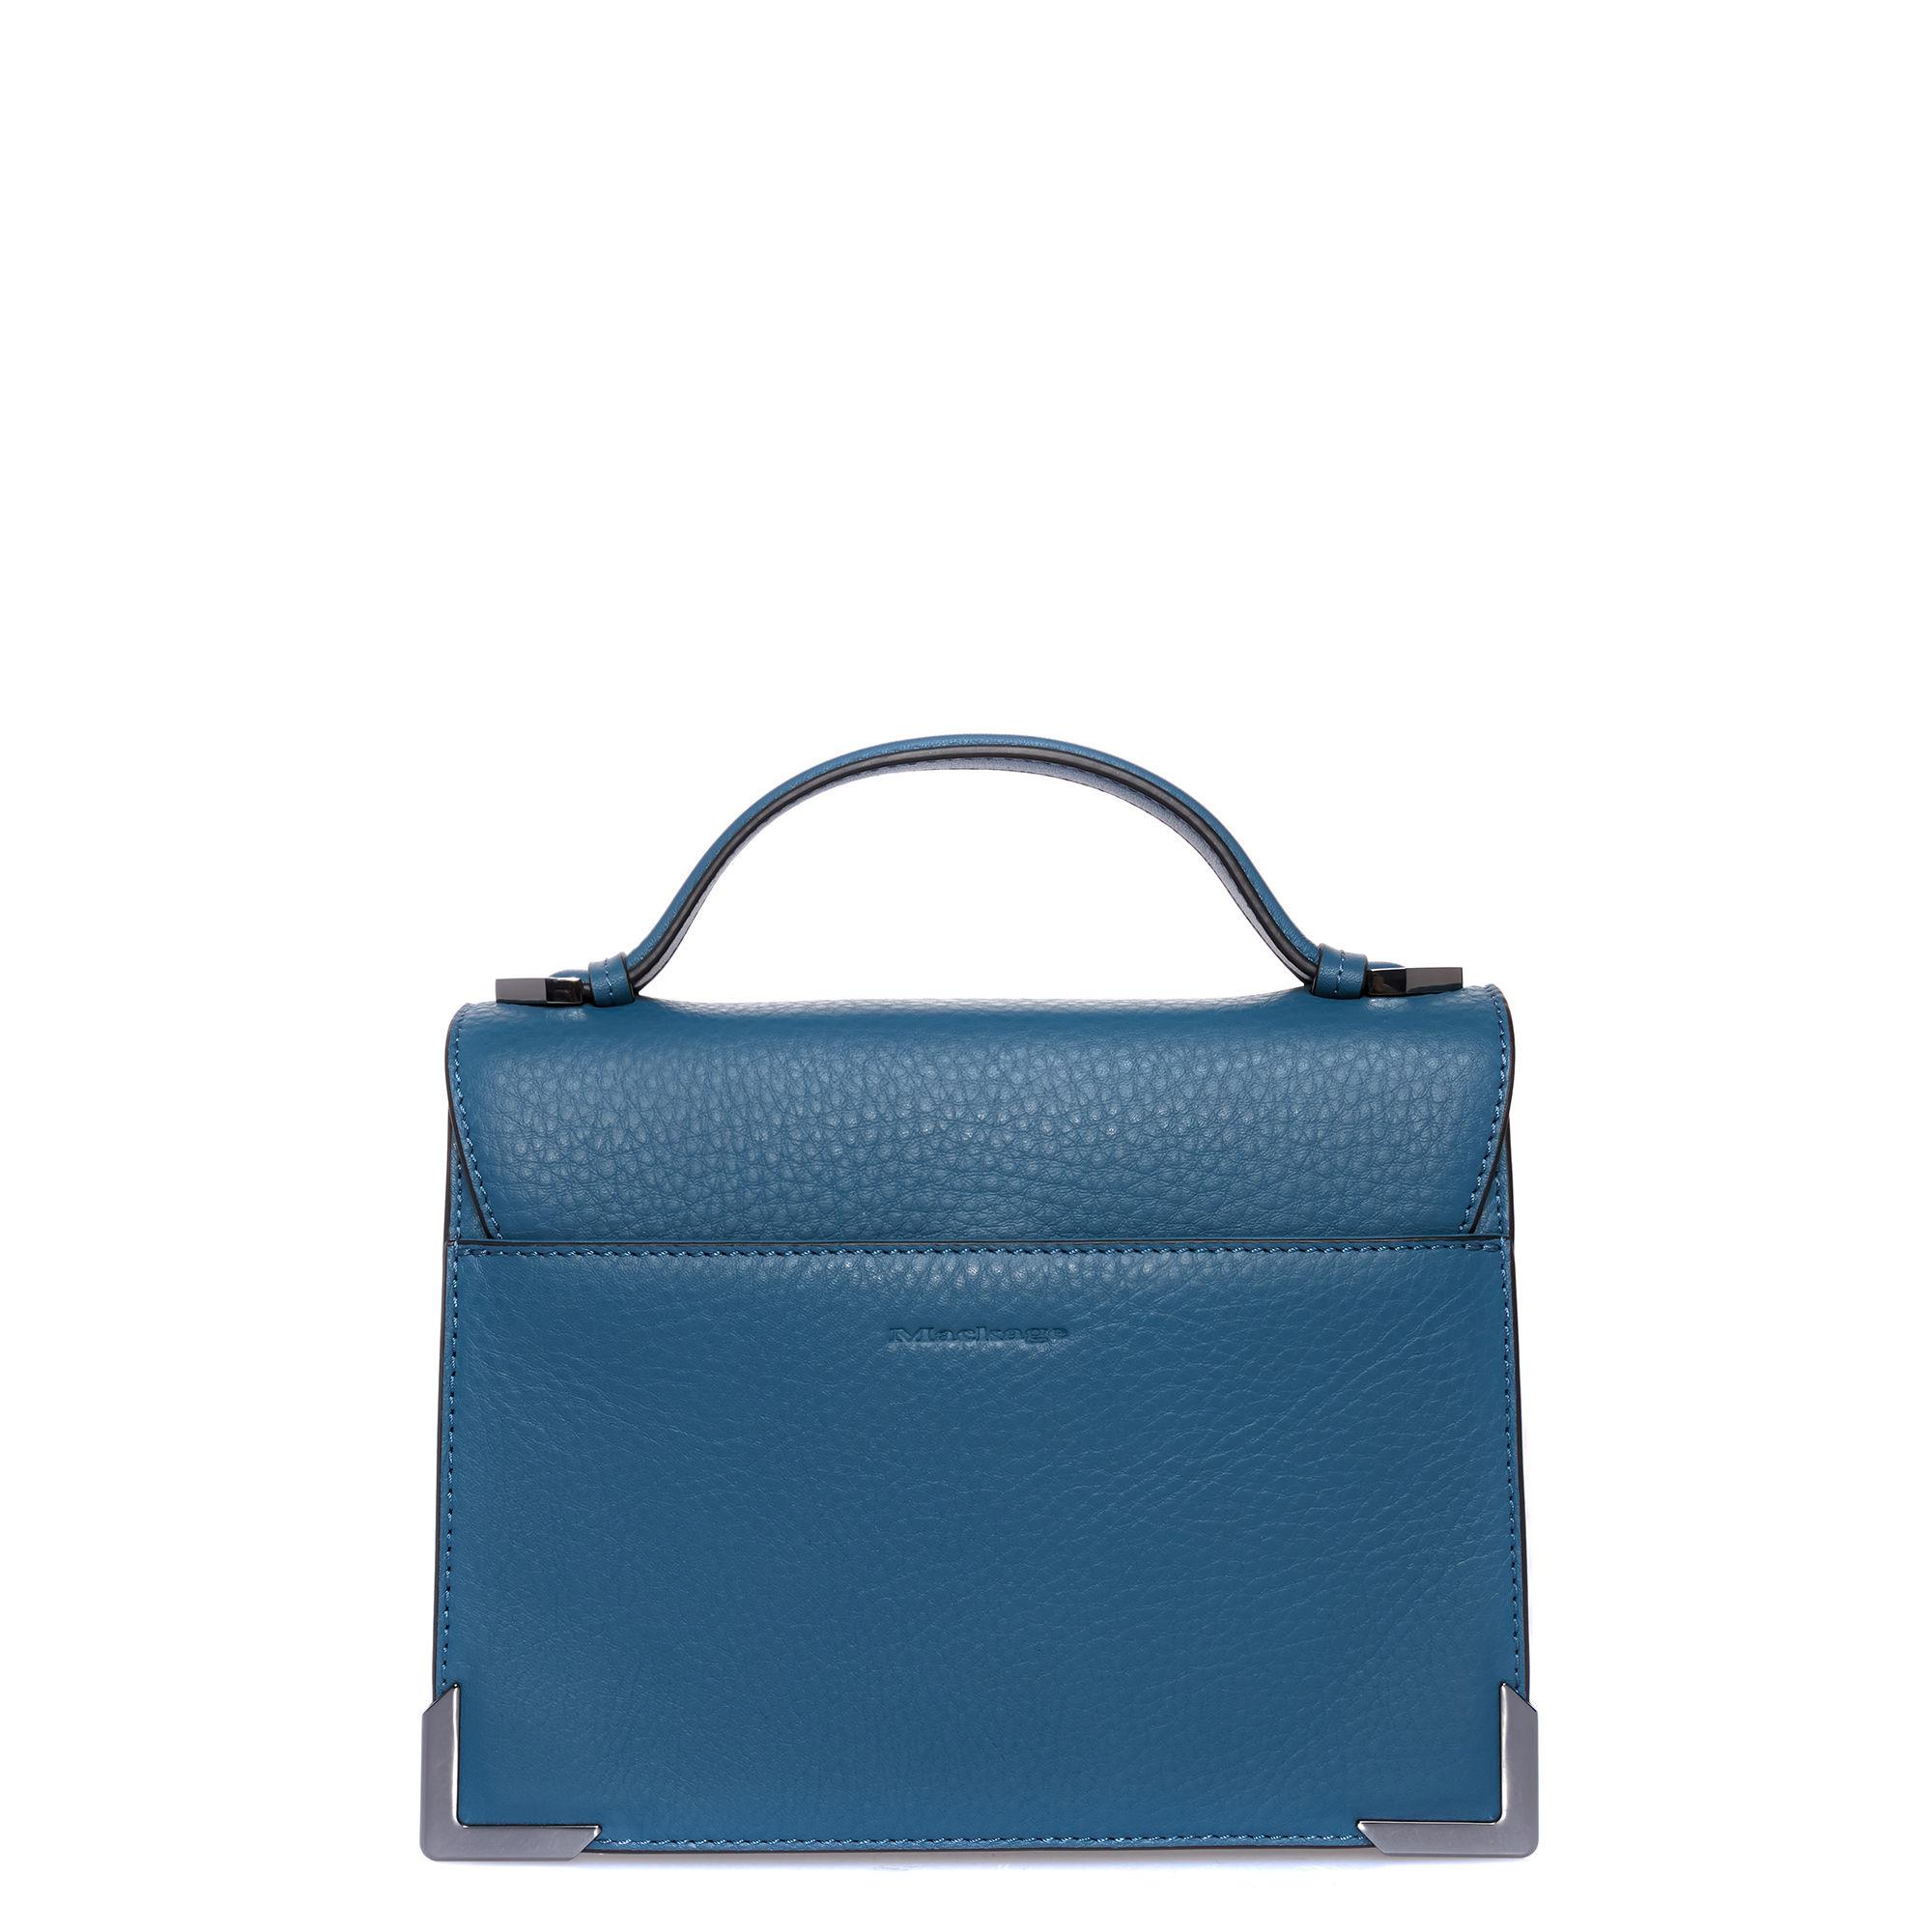 65edb2d133 order mackage mini rubie leather crossbody satchel available at nordstrom  effdf b2b87  sweden lyst mackage keeley leather crossbody bag in blue 4ea34  d98c7